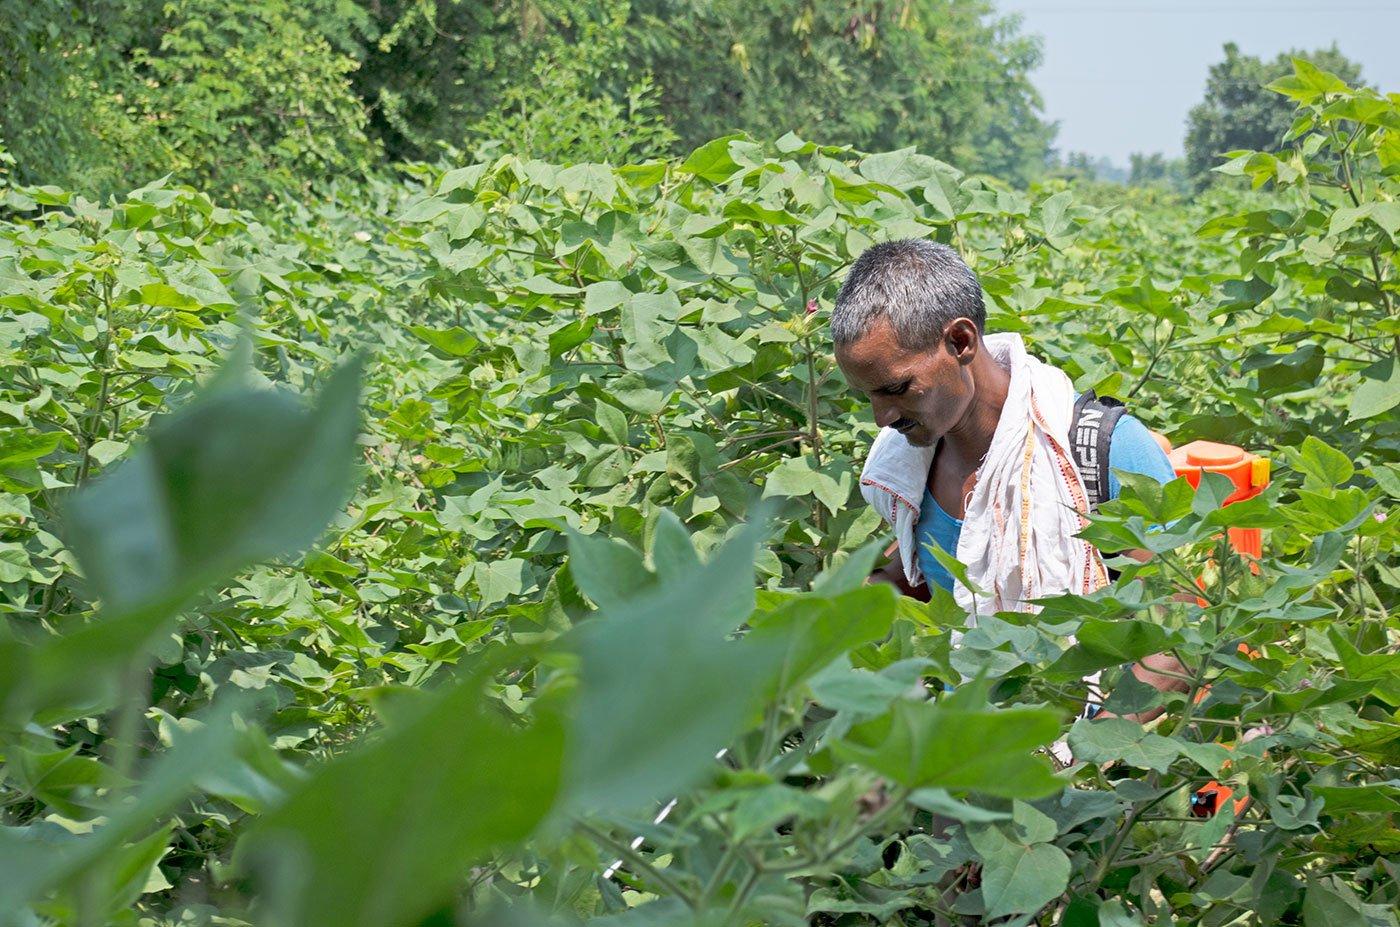 Farmer spraying pesticide in the cotton farm